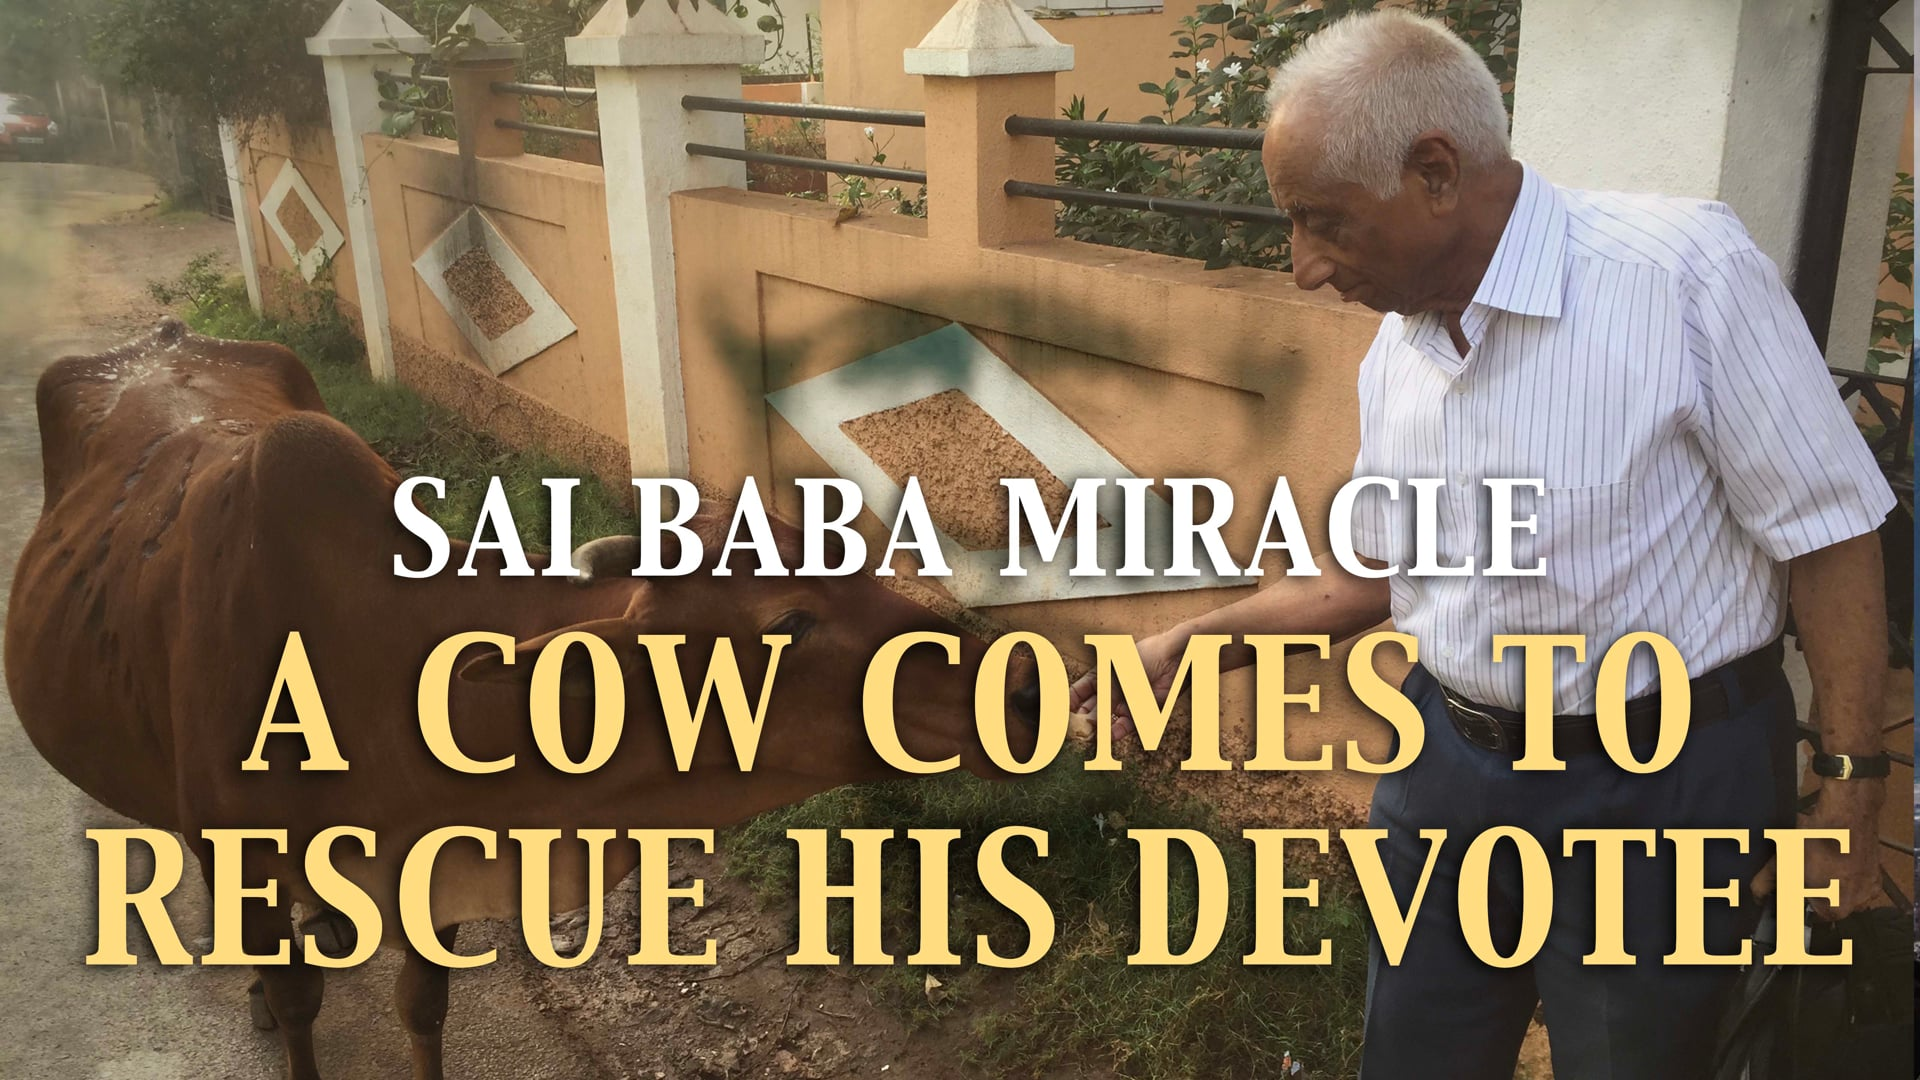 A cow comes to rescue His devotee